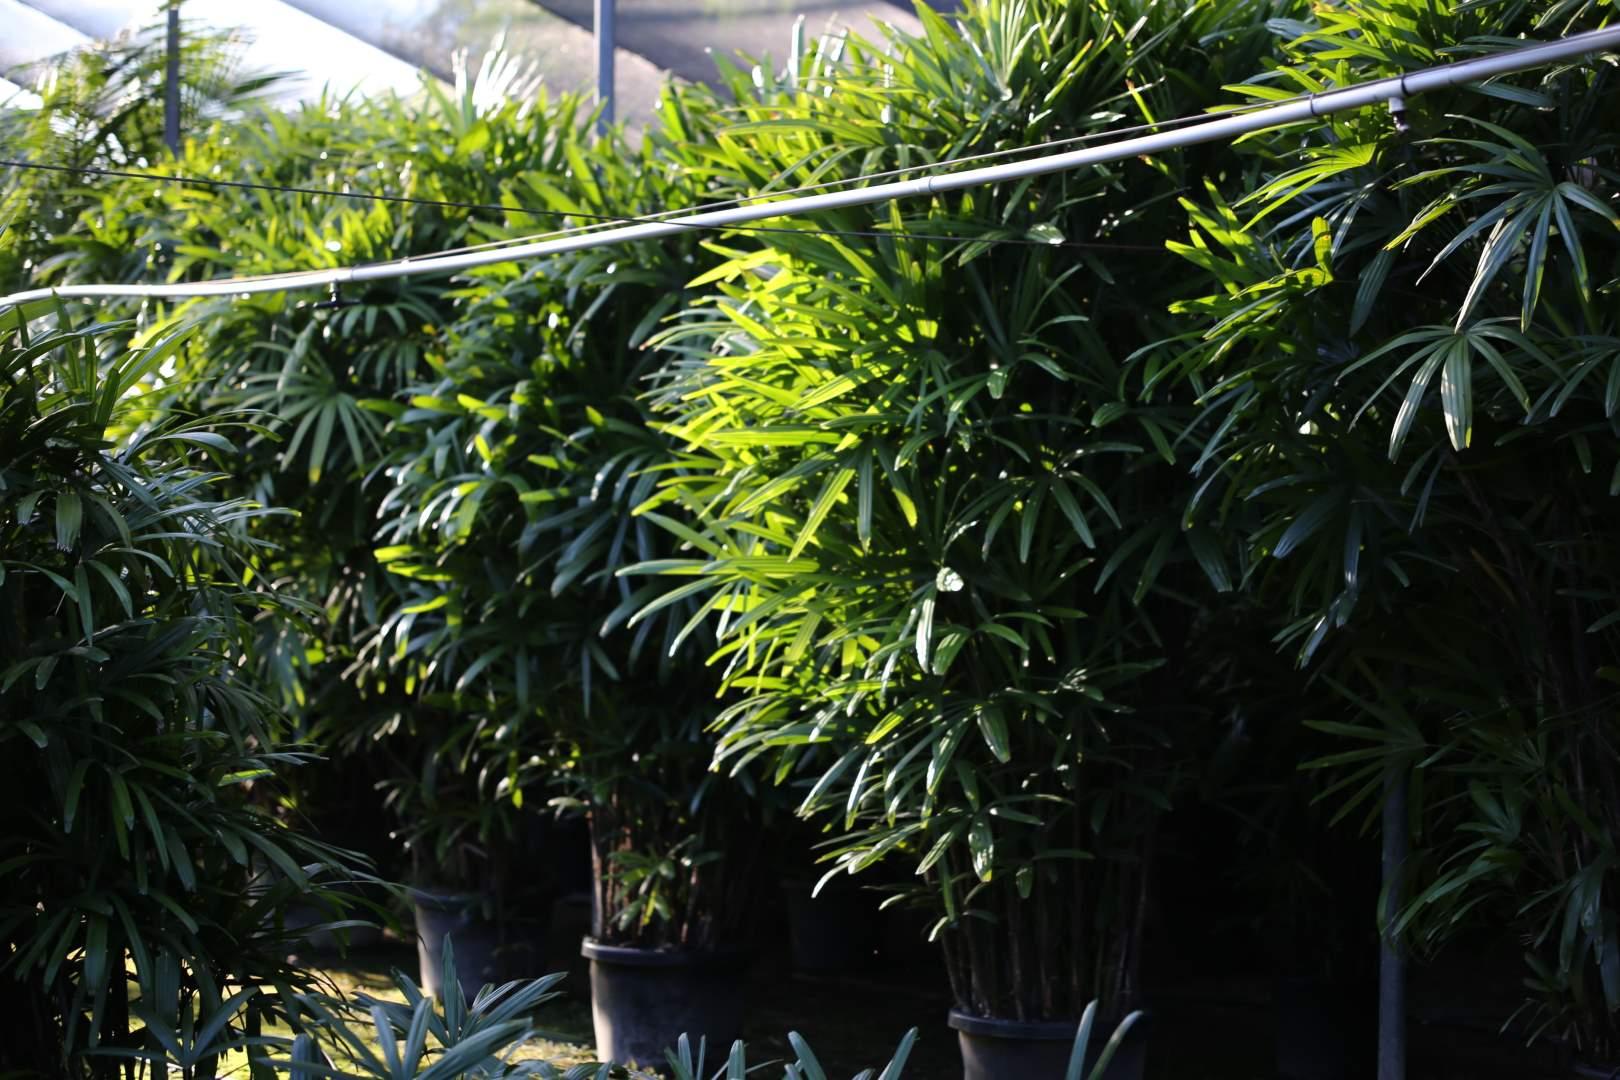 Row of Rhapis Palms at Oxley Nursery, Brisbane